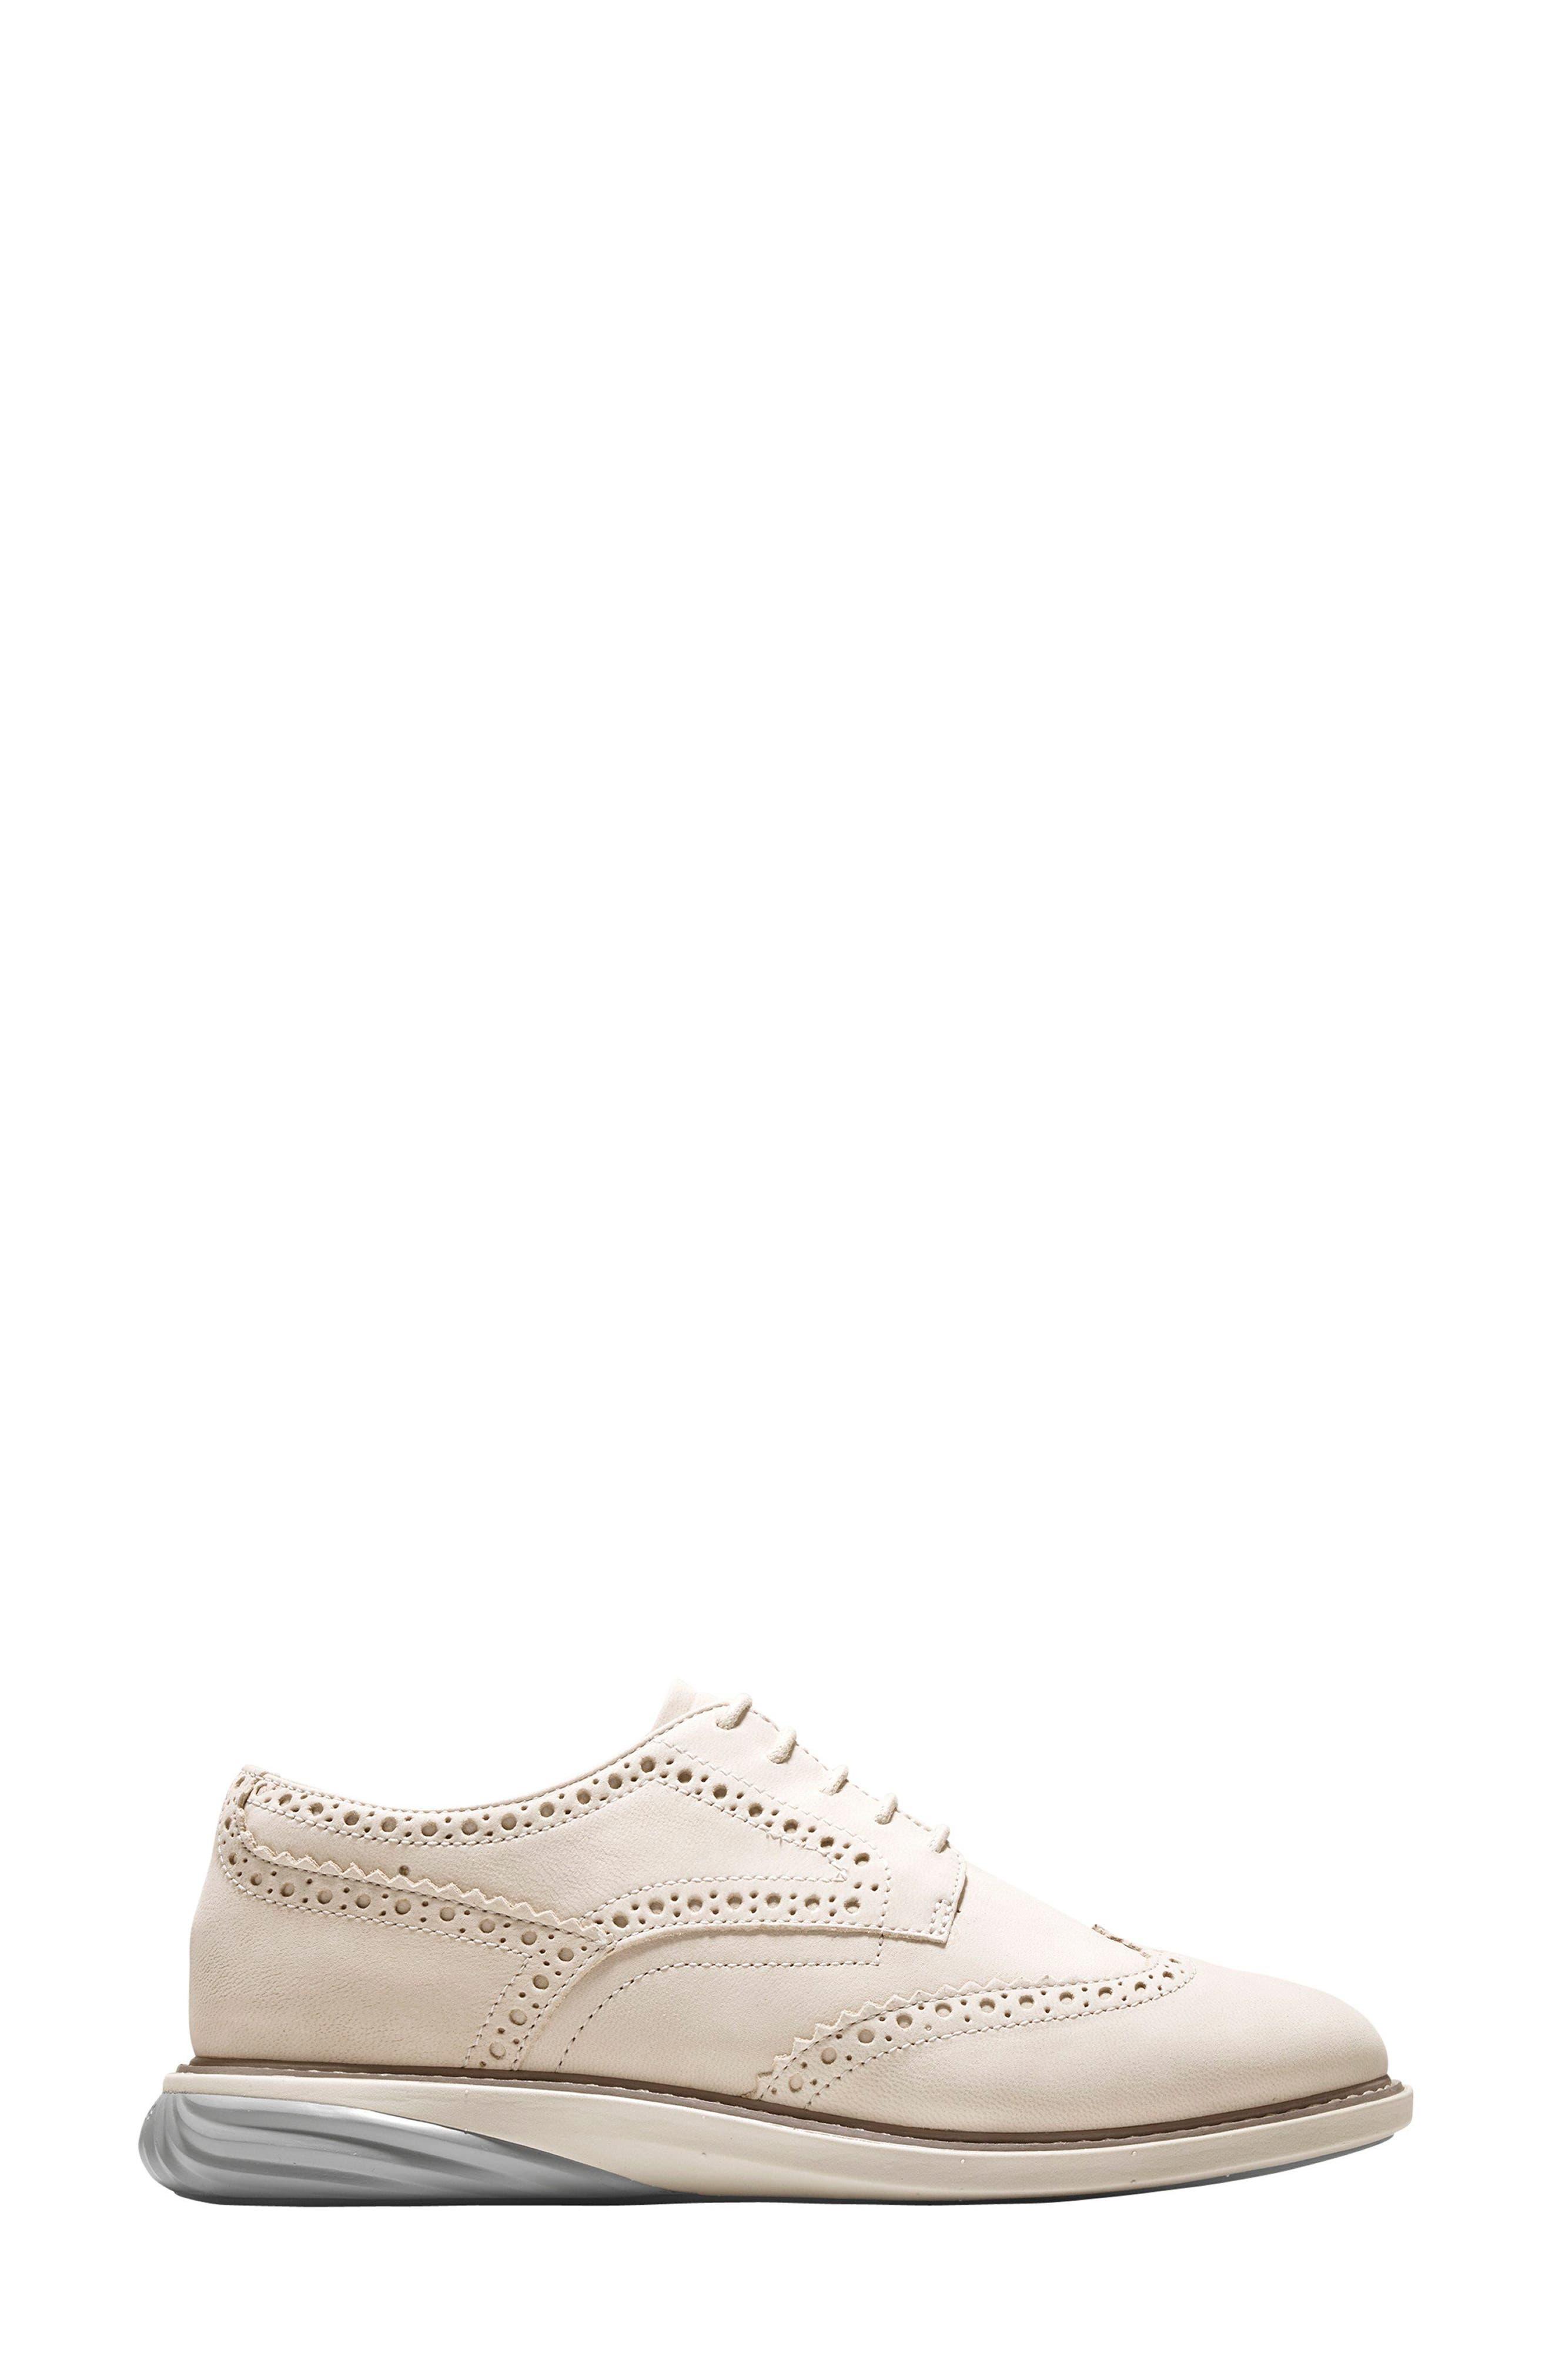 Grandevolution Shortwing Oxford Sneaker,                             Alternate thumbnail 3, color,                             Pumice Stone Nubuck